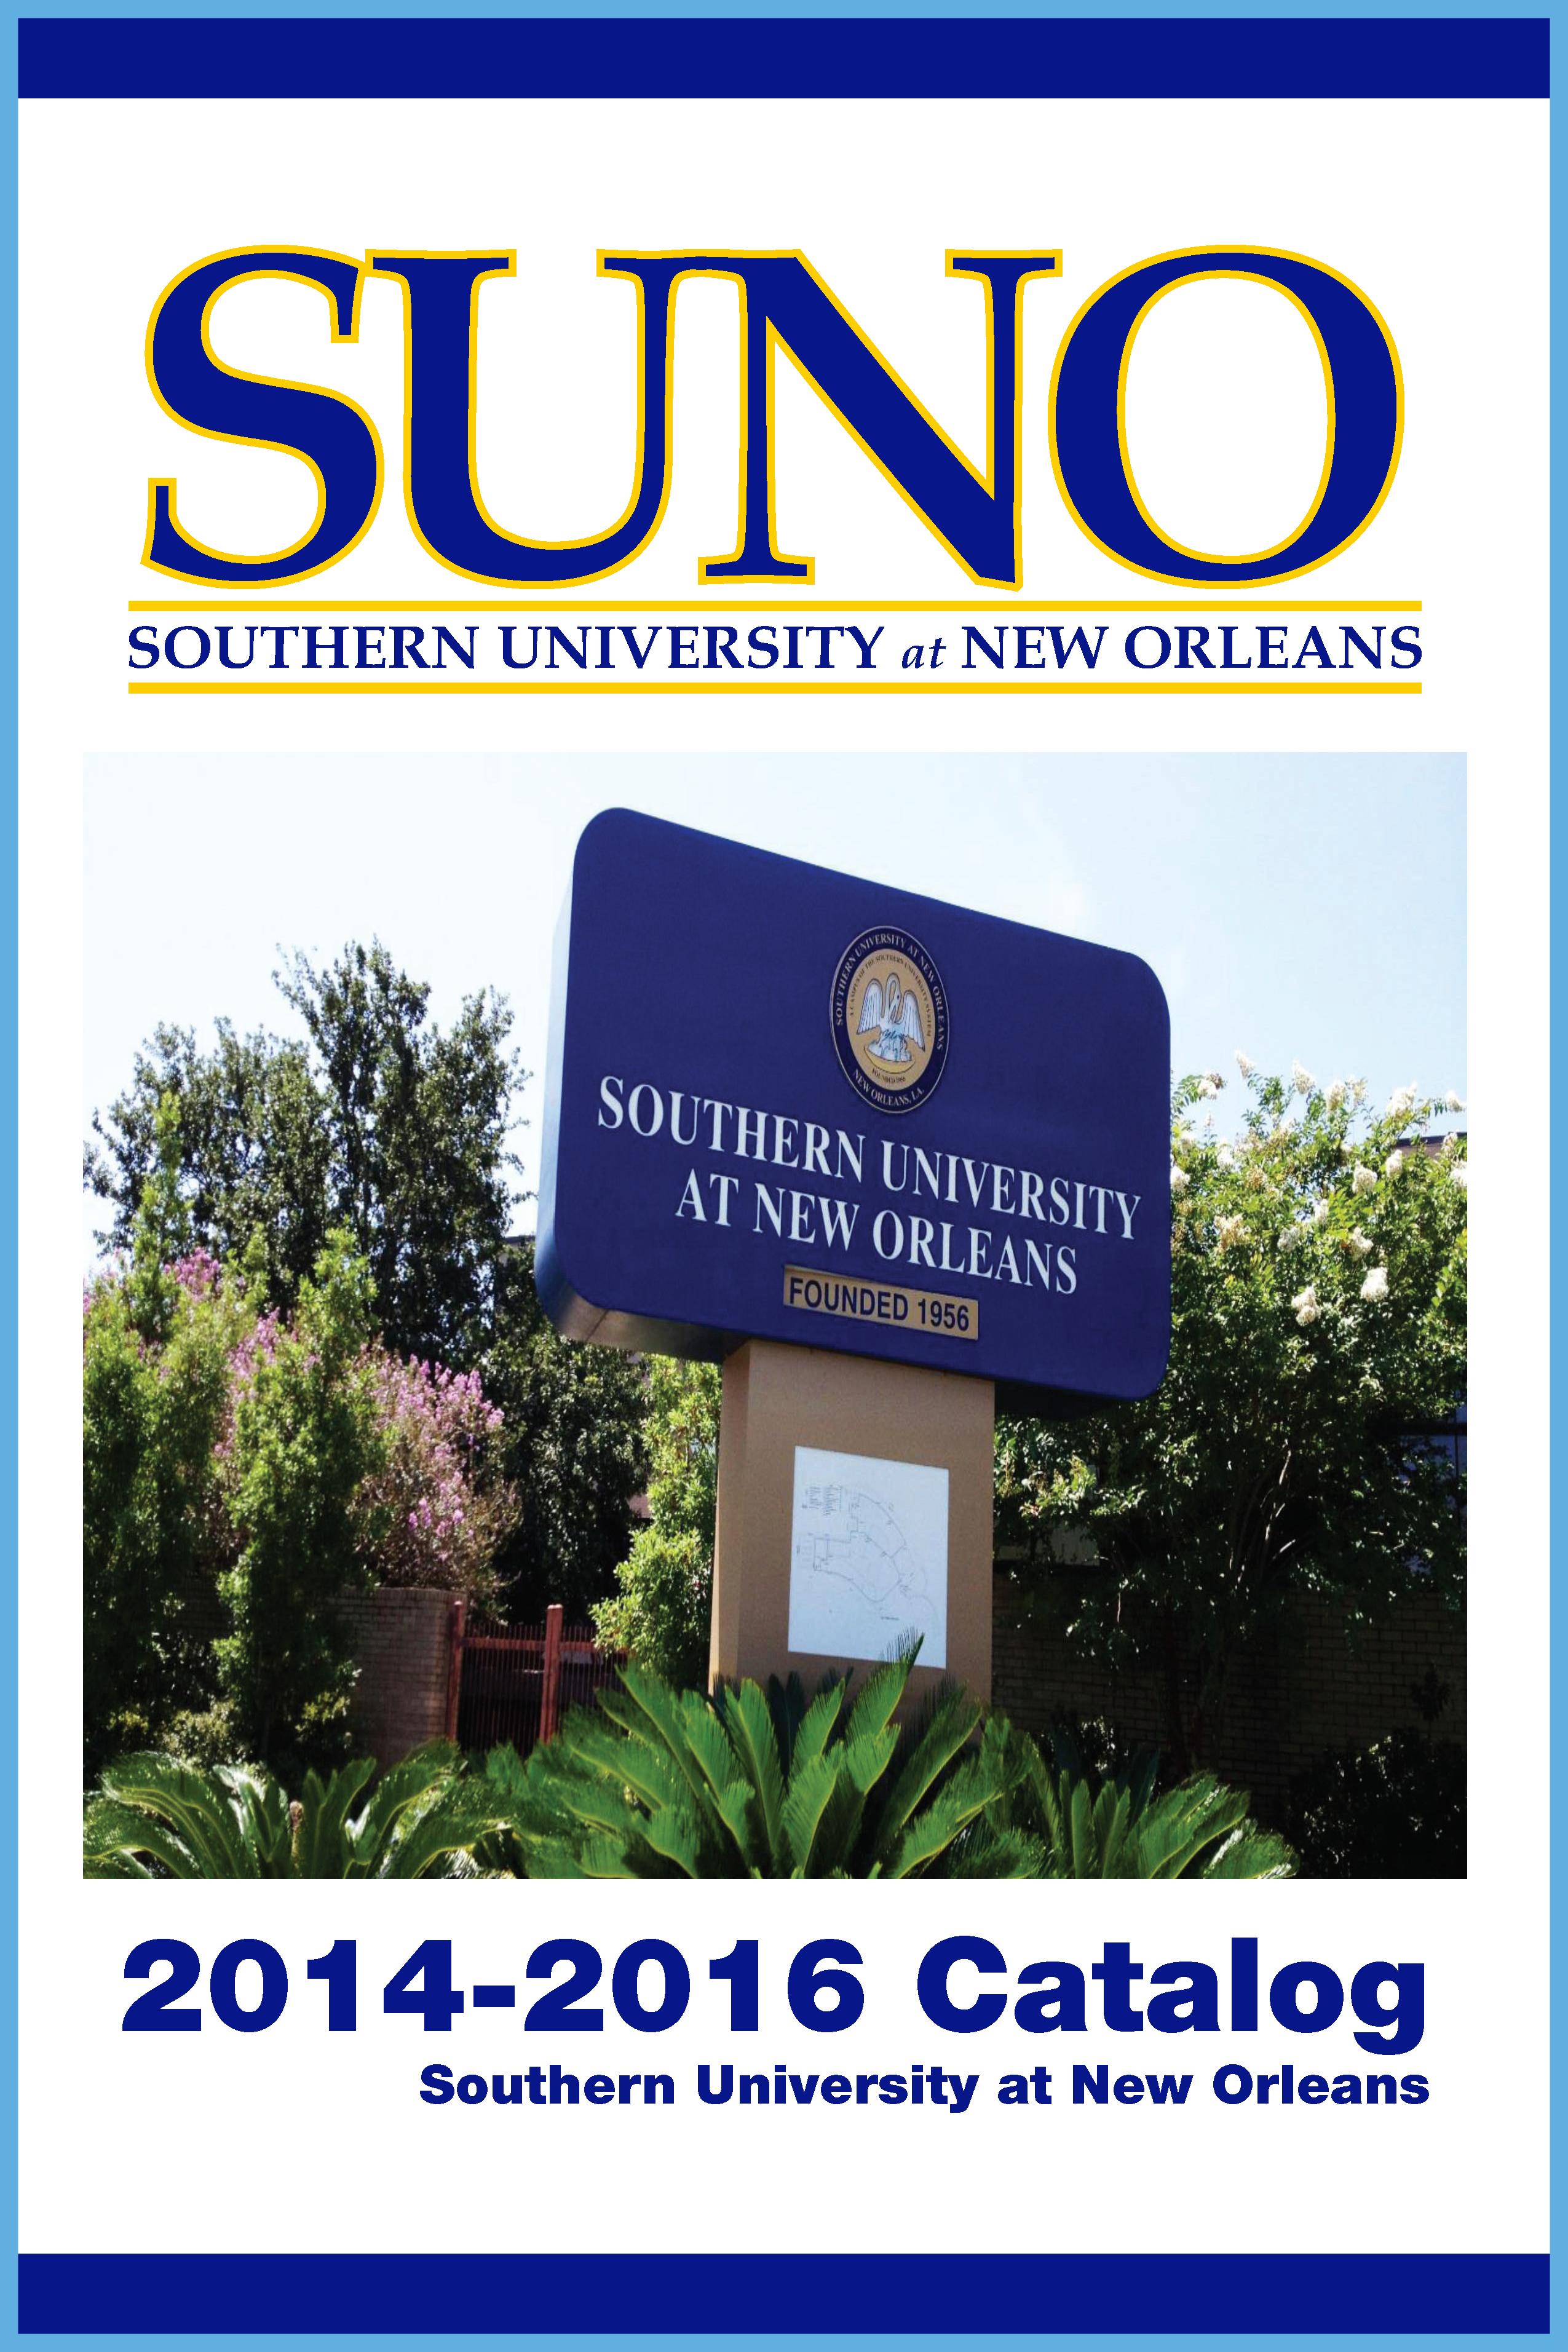 2014-2016 Catalog